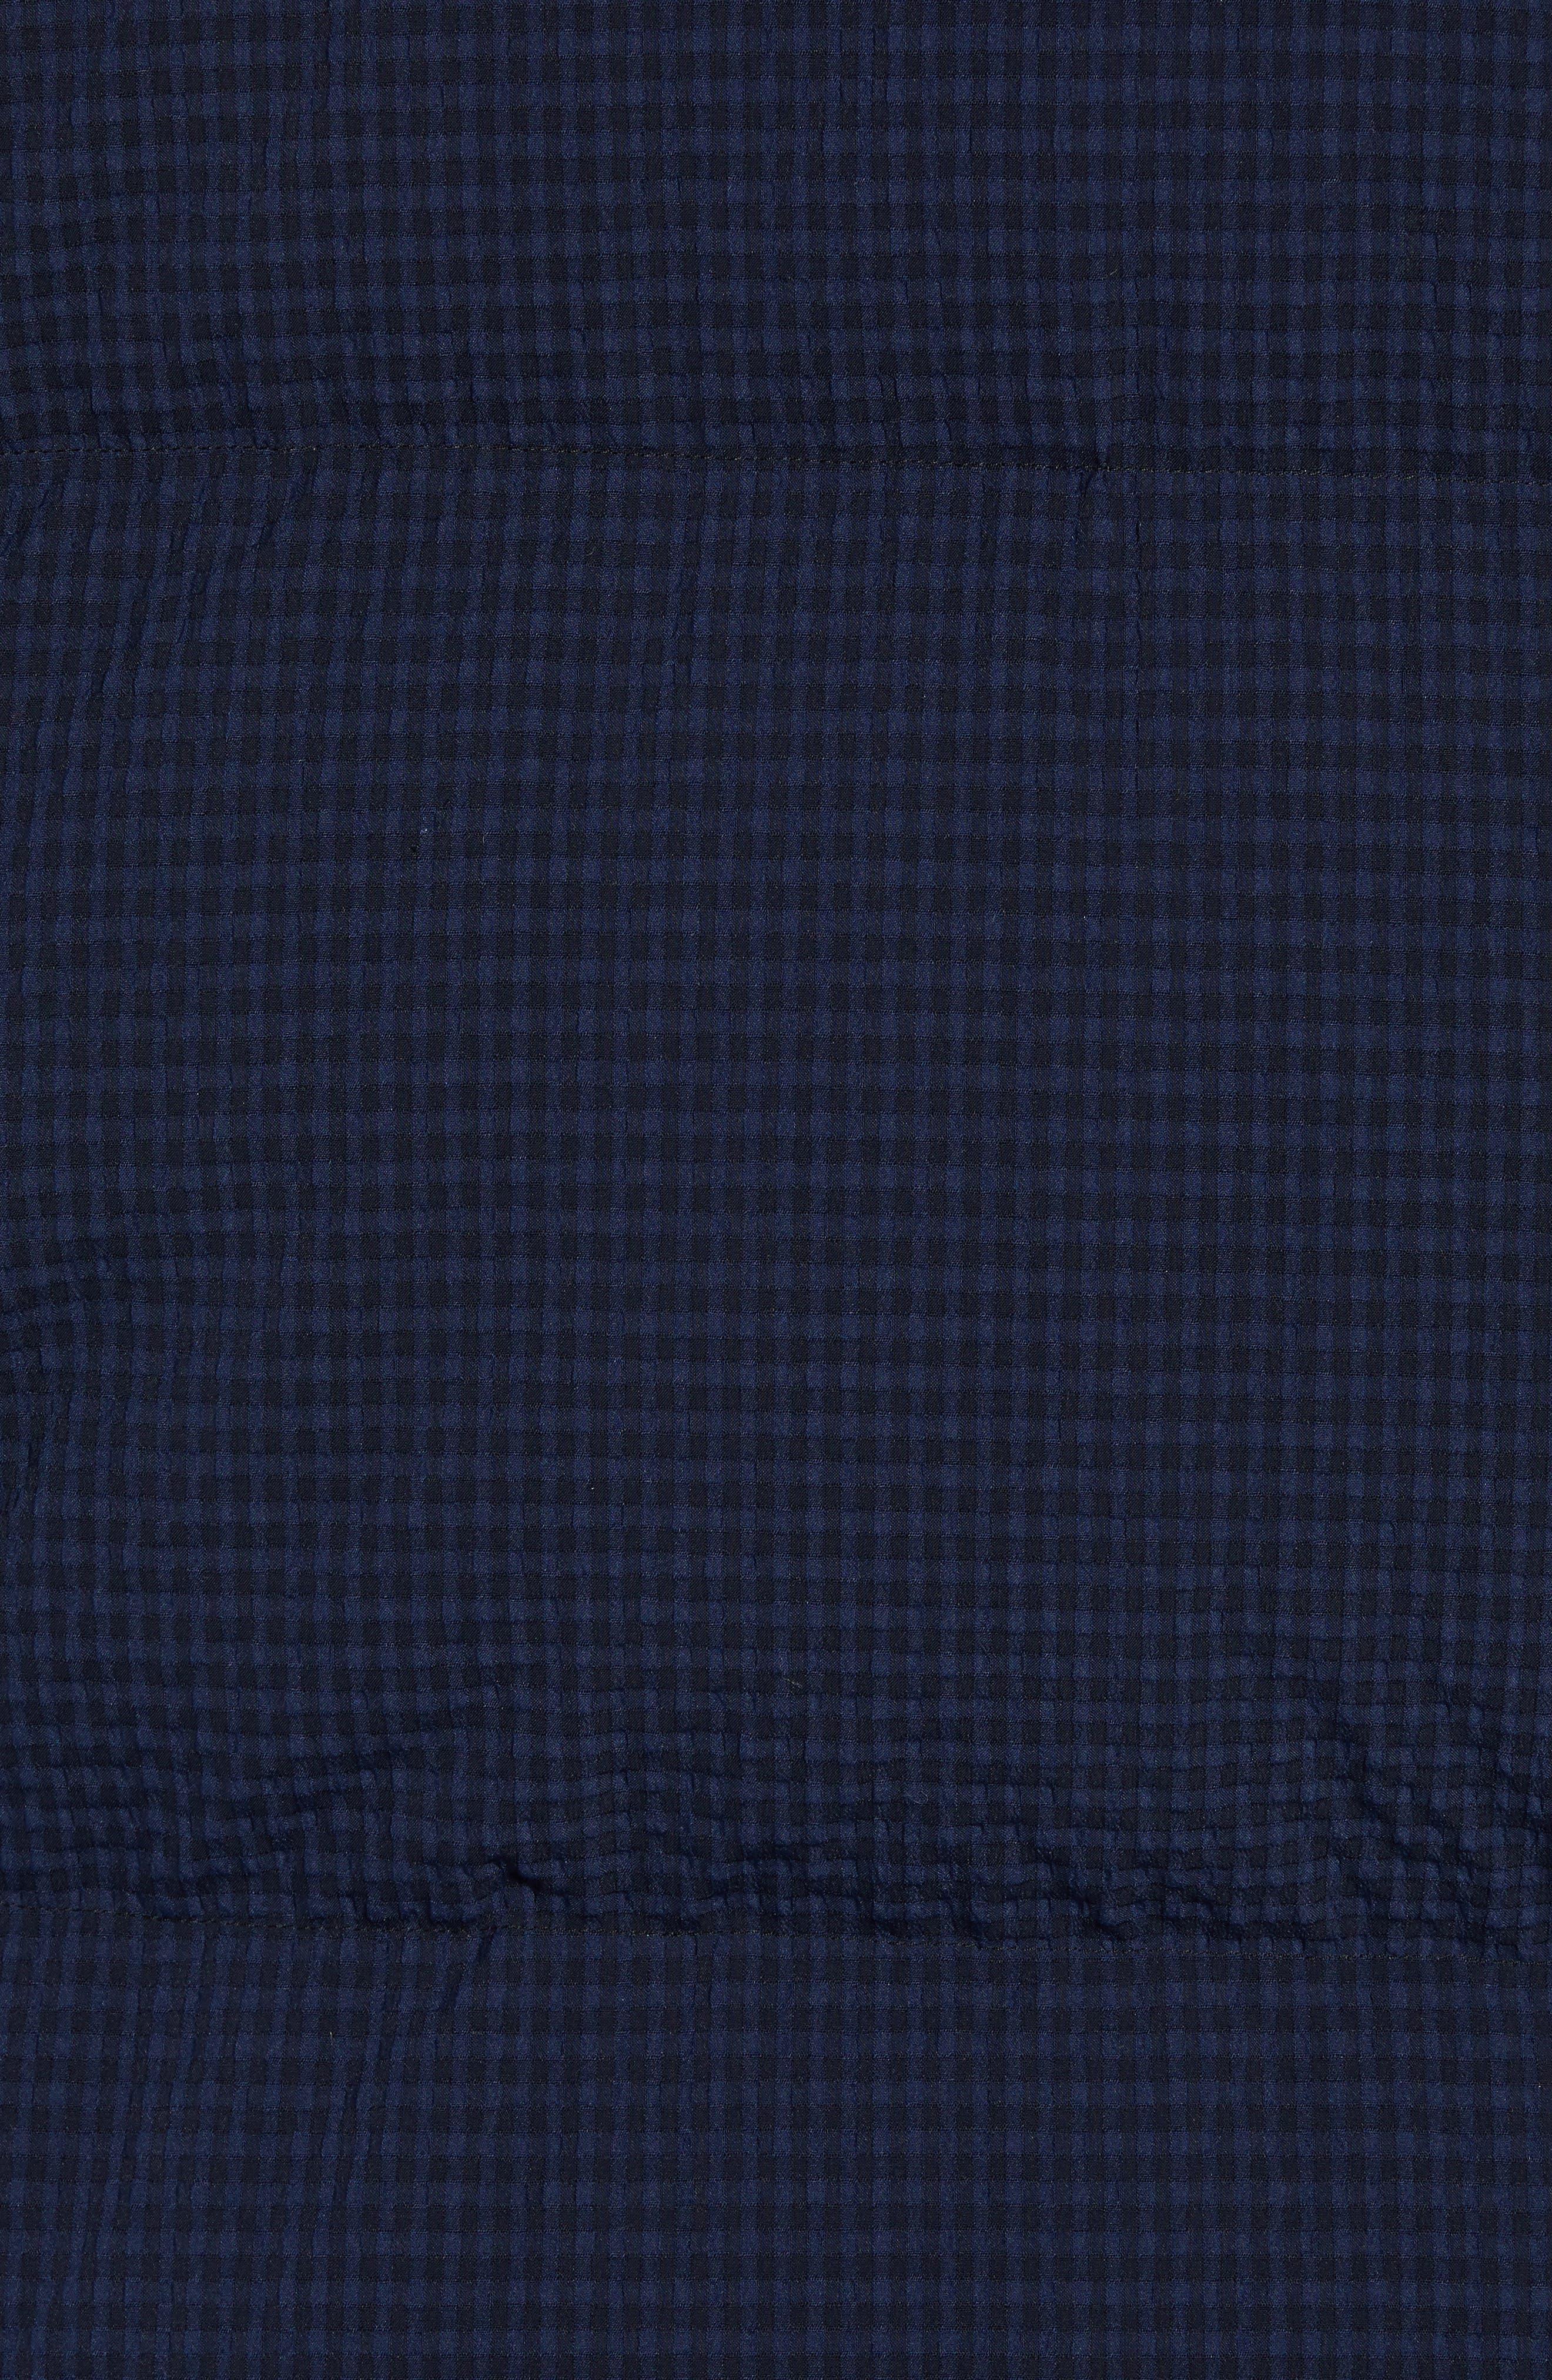 Fulton 3 Regular Fit Seersucker Puffer Jacket,                             Alternate thumbnail 6, color,                             ECLIPSE MULTI